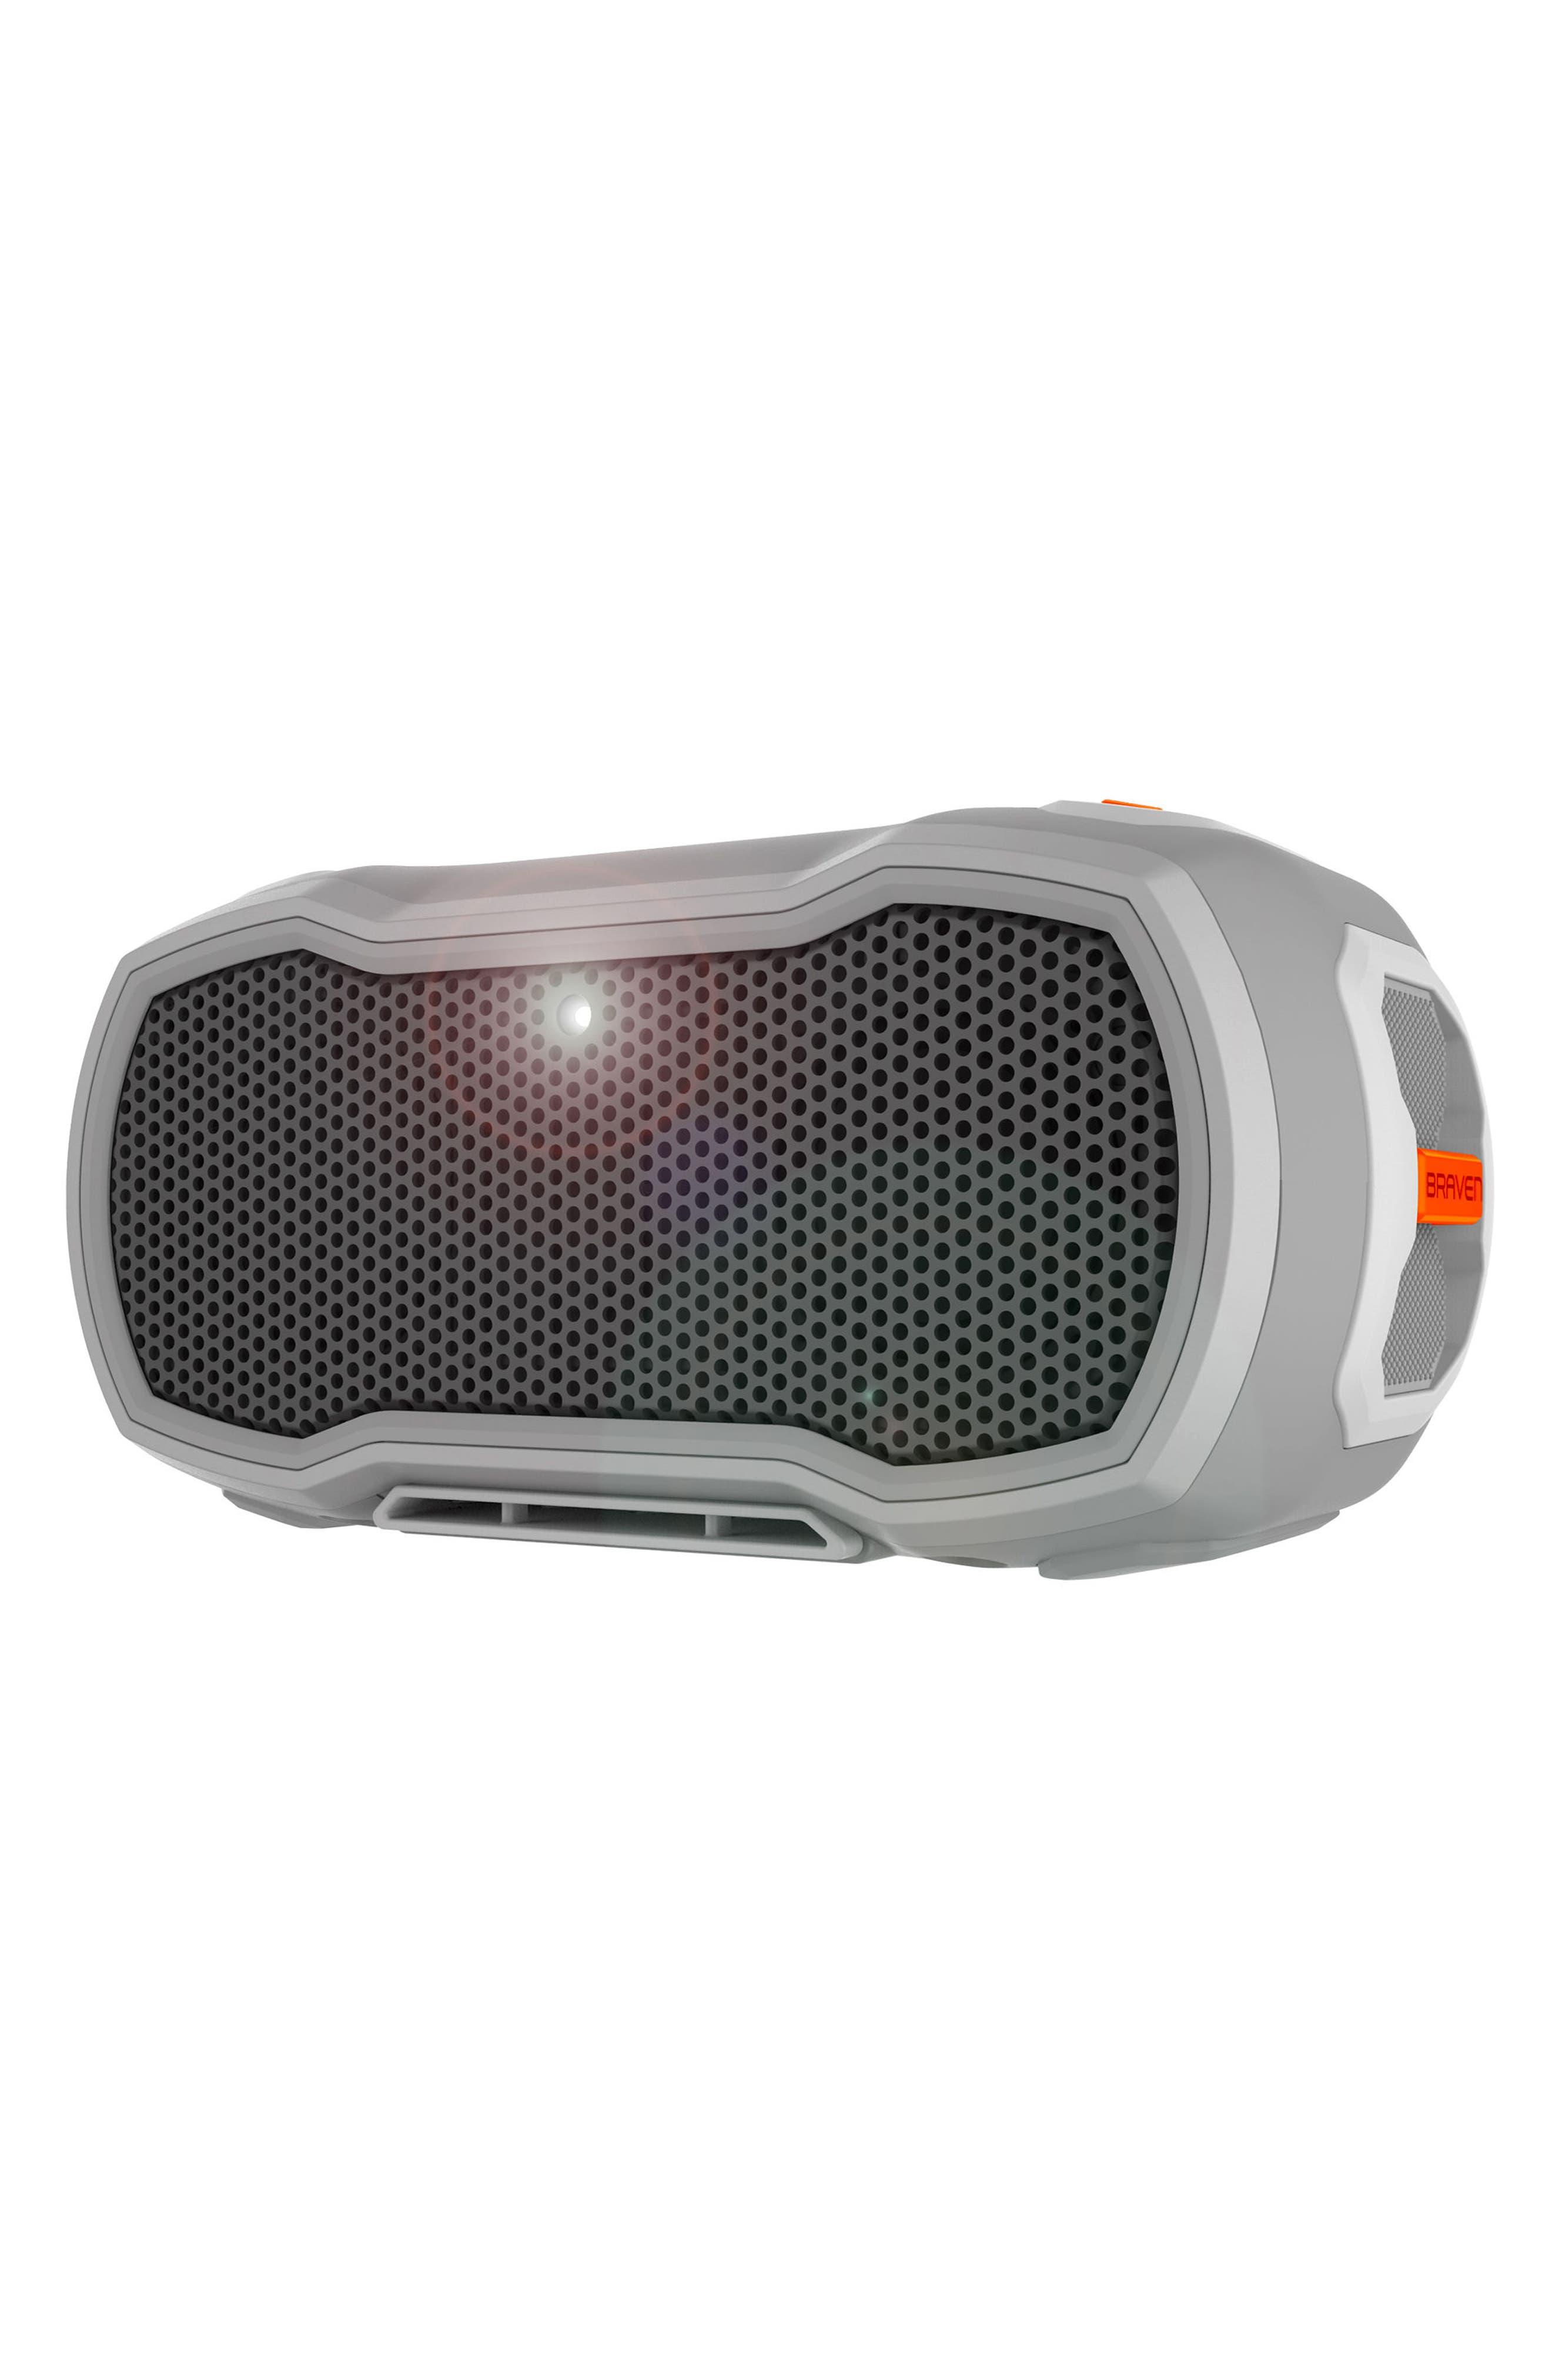 Ready Pro Bluetooth<sup>®</sup> Speaker,                             Alternate thumbnail 2, color,                             Grey/ Orange